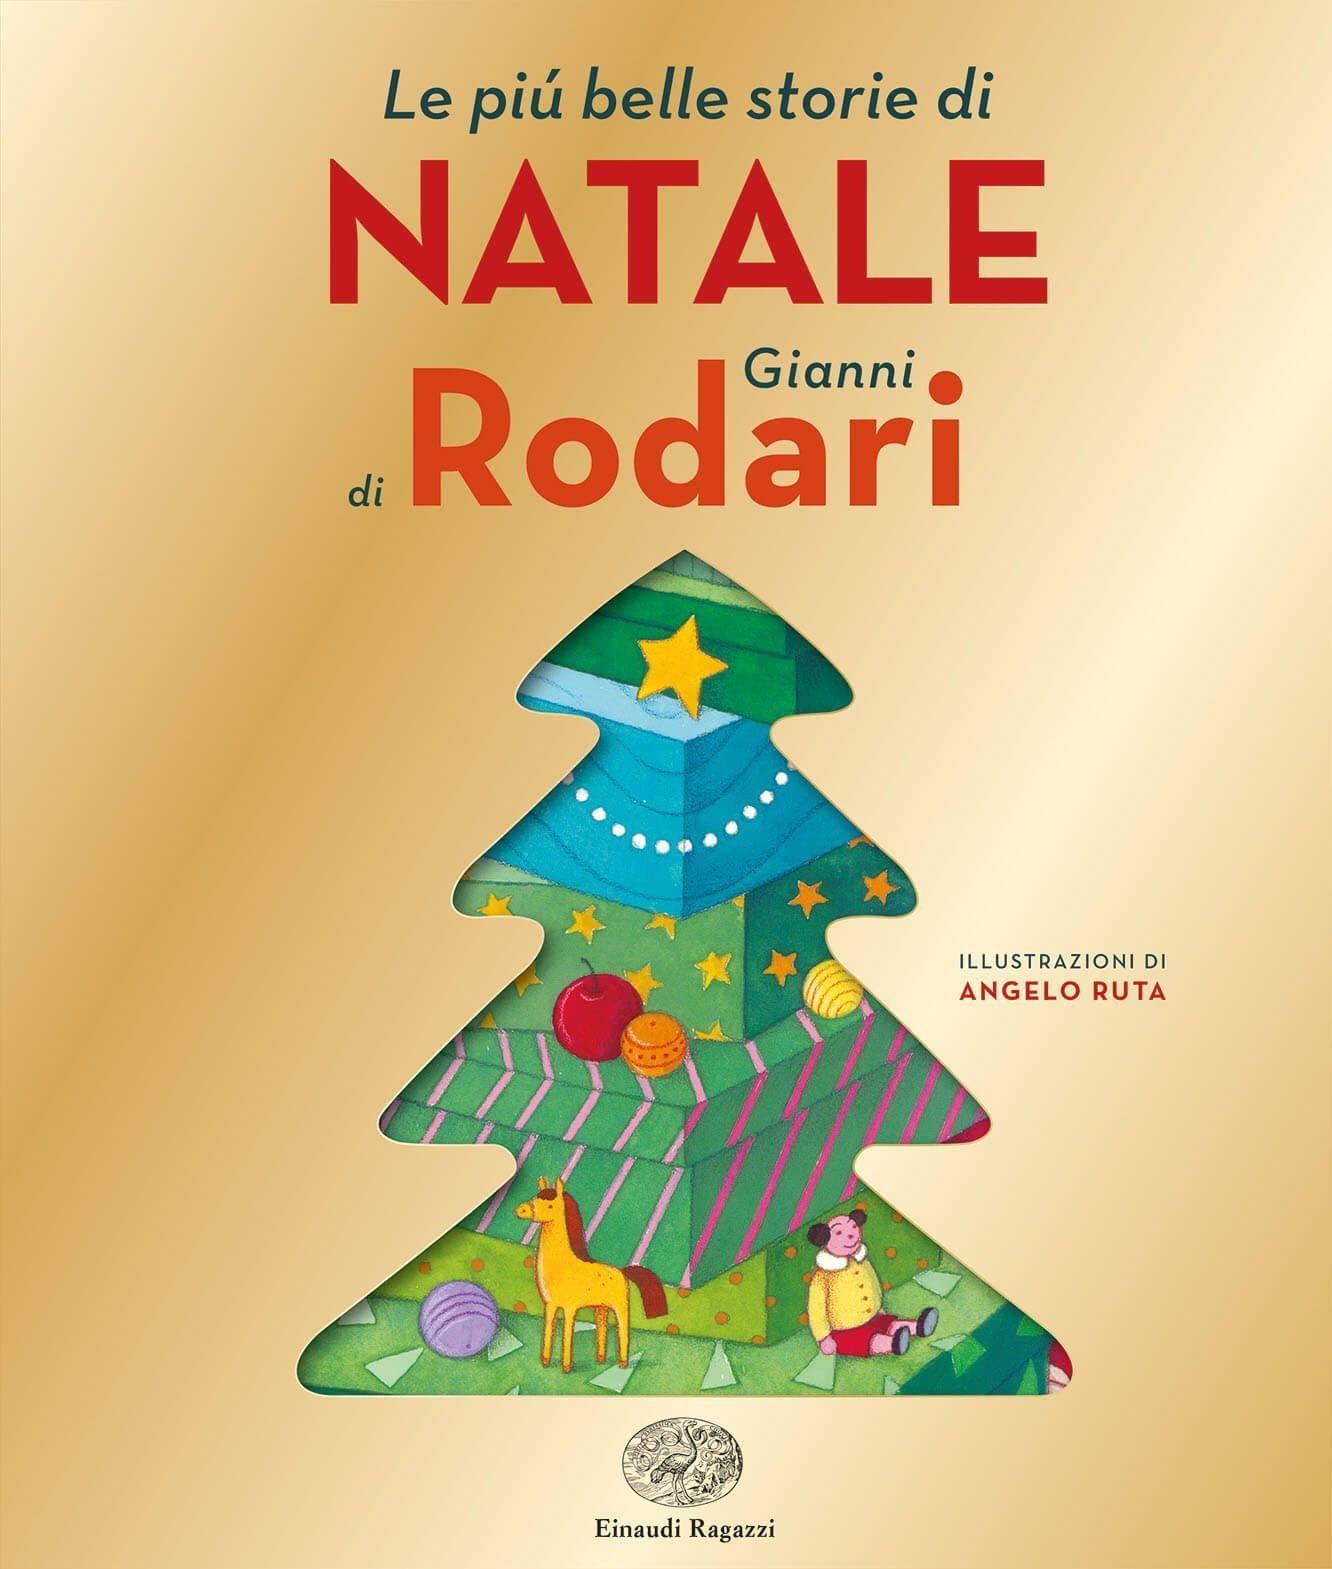 Le-più-belle-storie-di-Natale-di-Gianni-Rodari-RodarRuta-Einaudi-Ragazzi-9788866565642